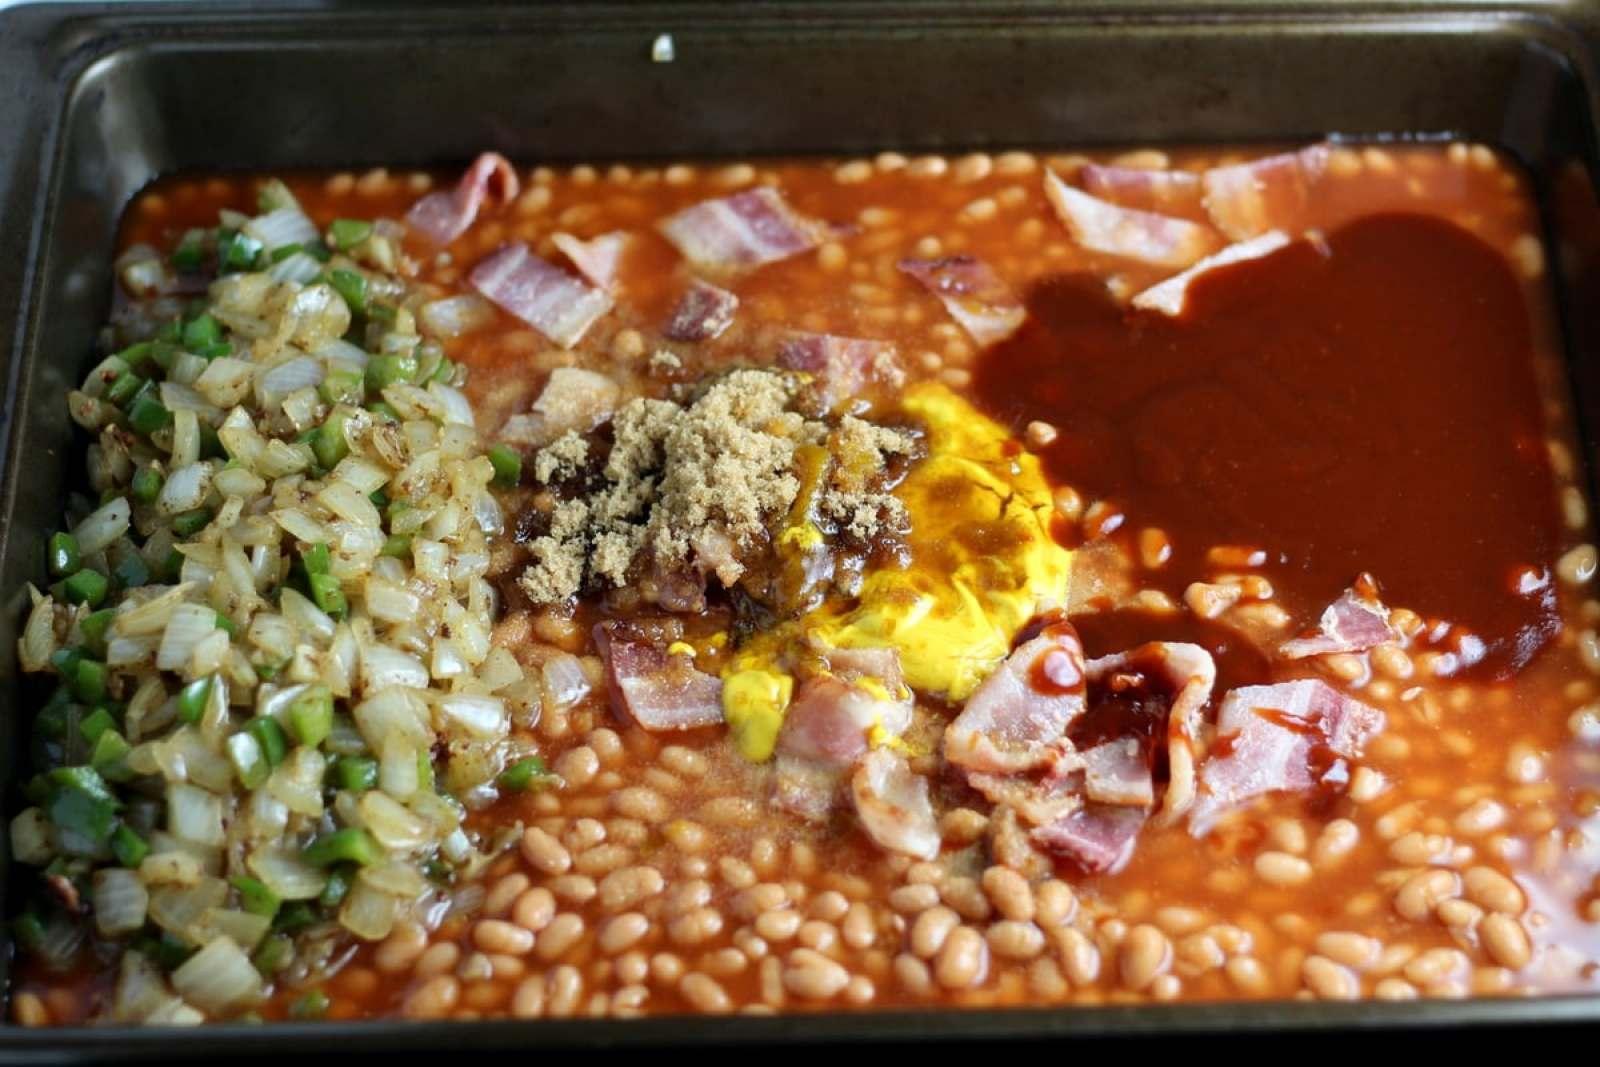 Homemade Baked Beans - thewoodenskillet.com